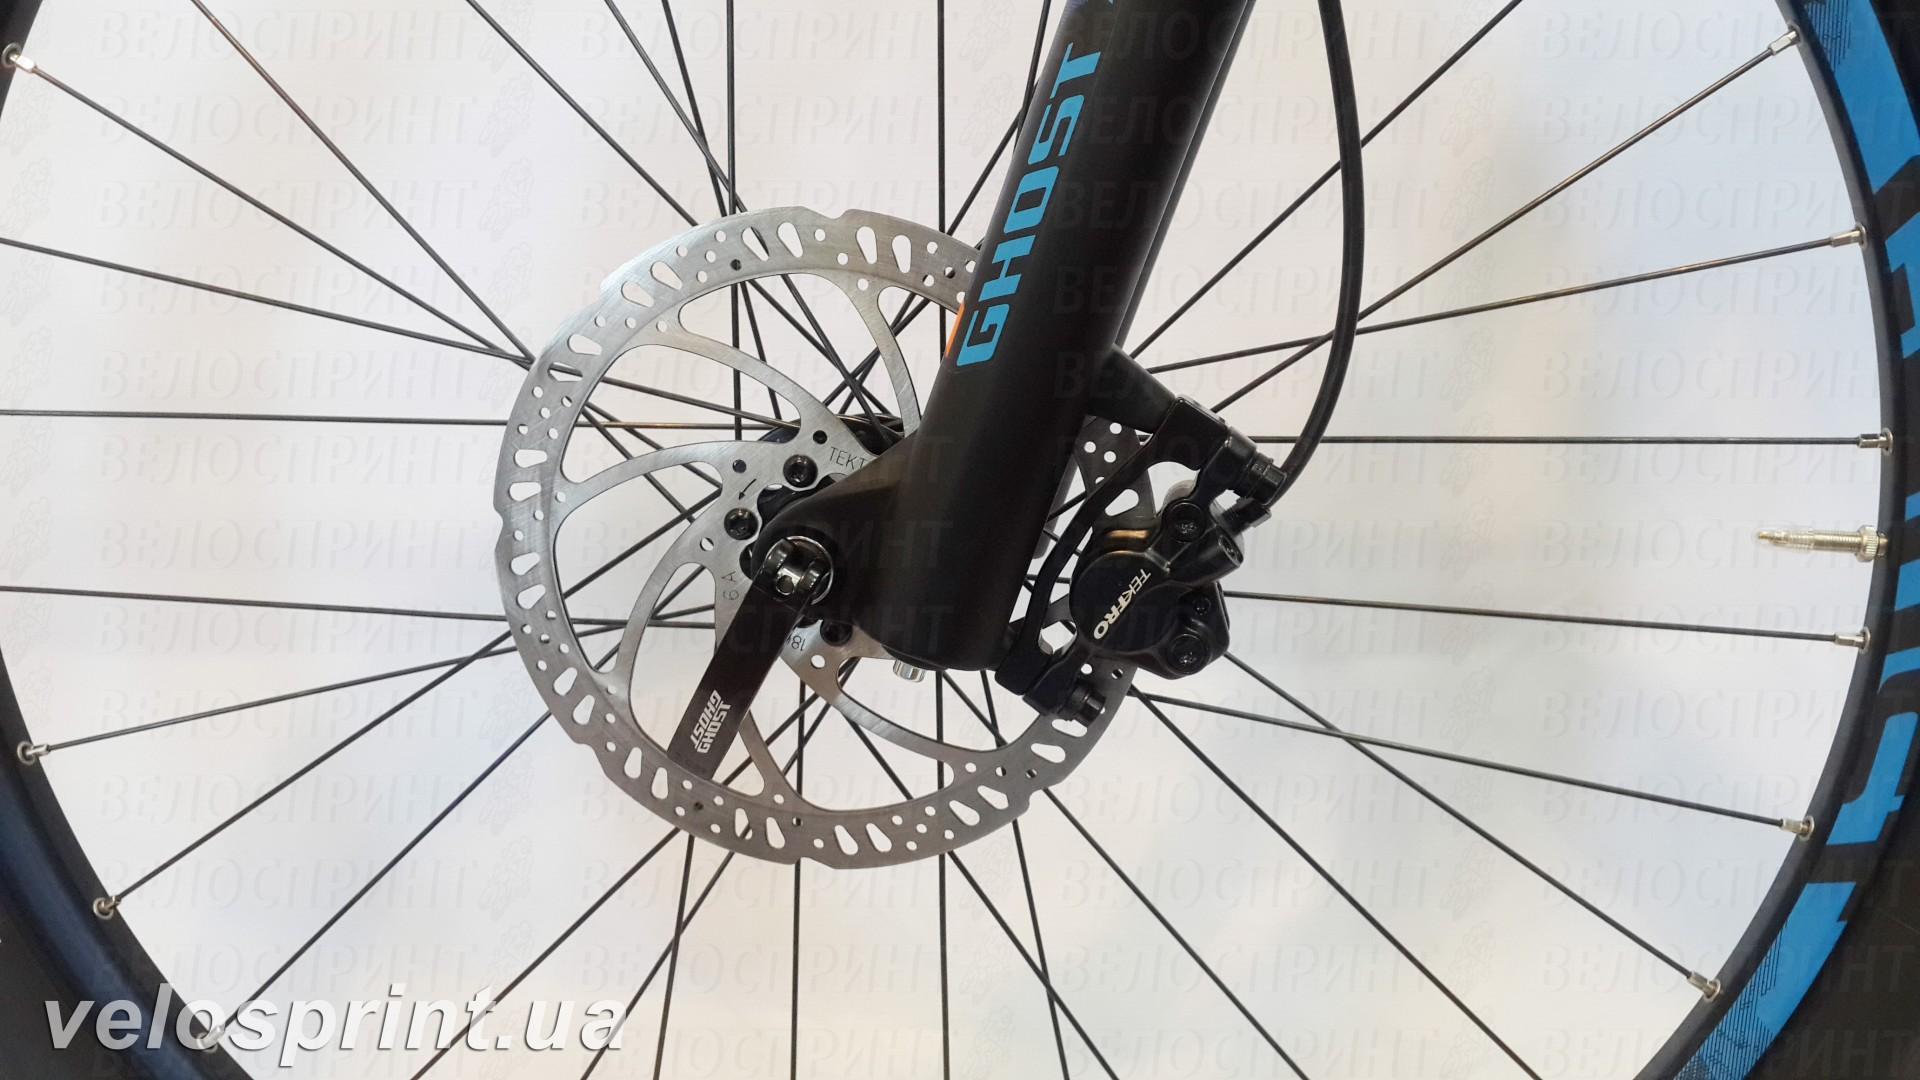 Велосипед GHOST Kato FS 2 AL 27.5 nightblack/riotblue/monarchorange передний тормоз год 2017